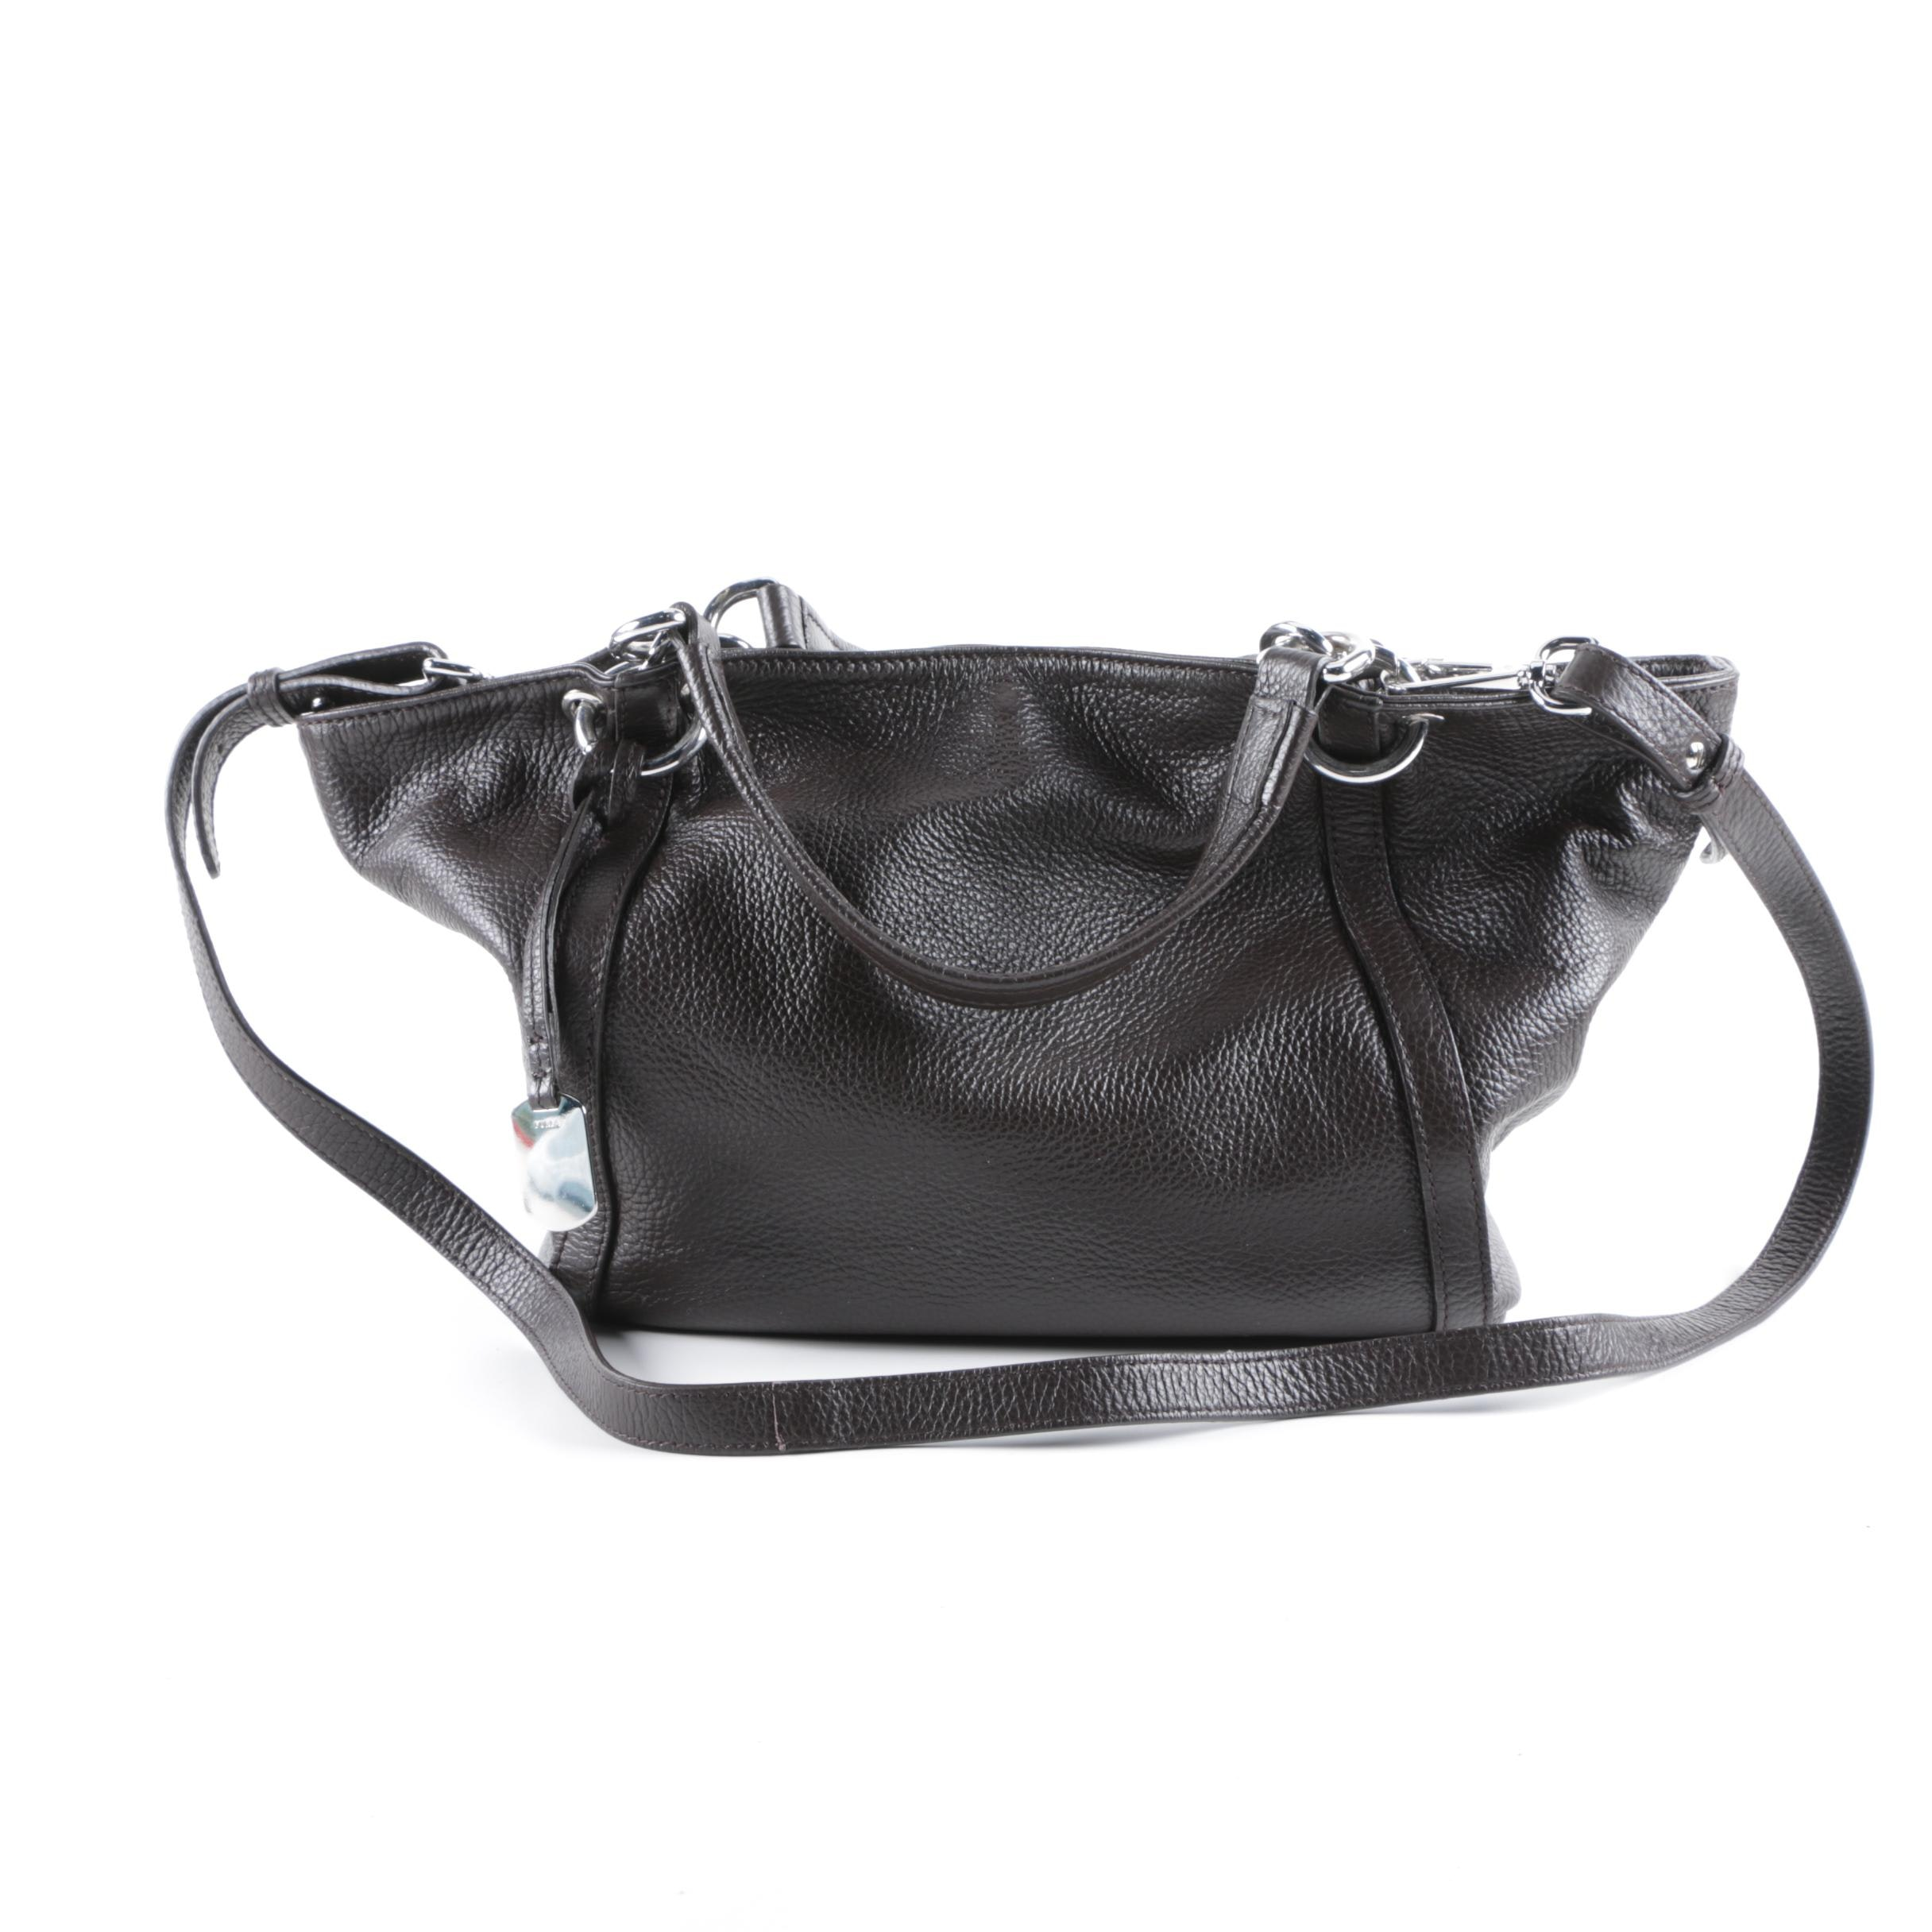 Furla Black Pebbled Leather Tote